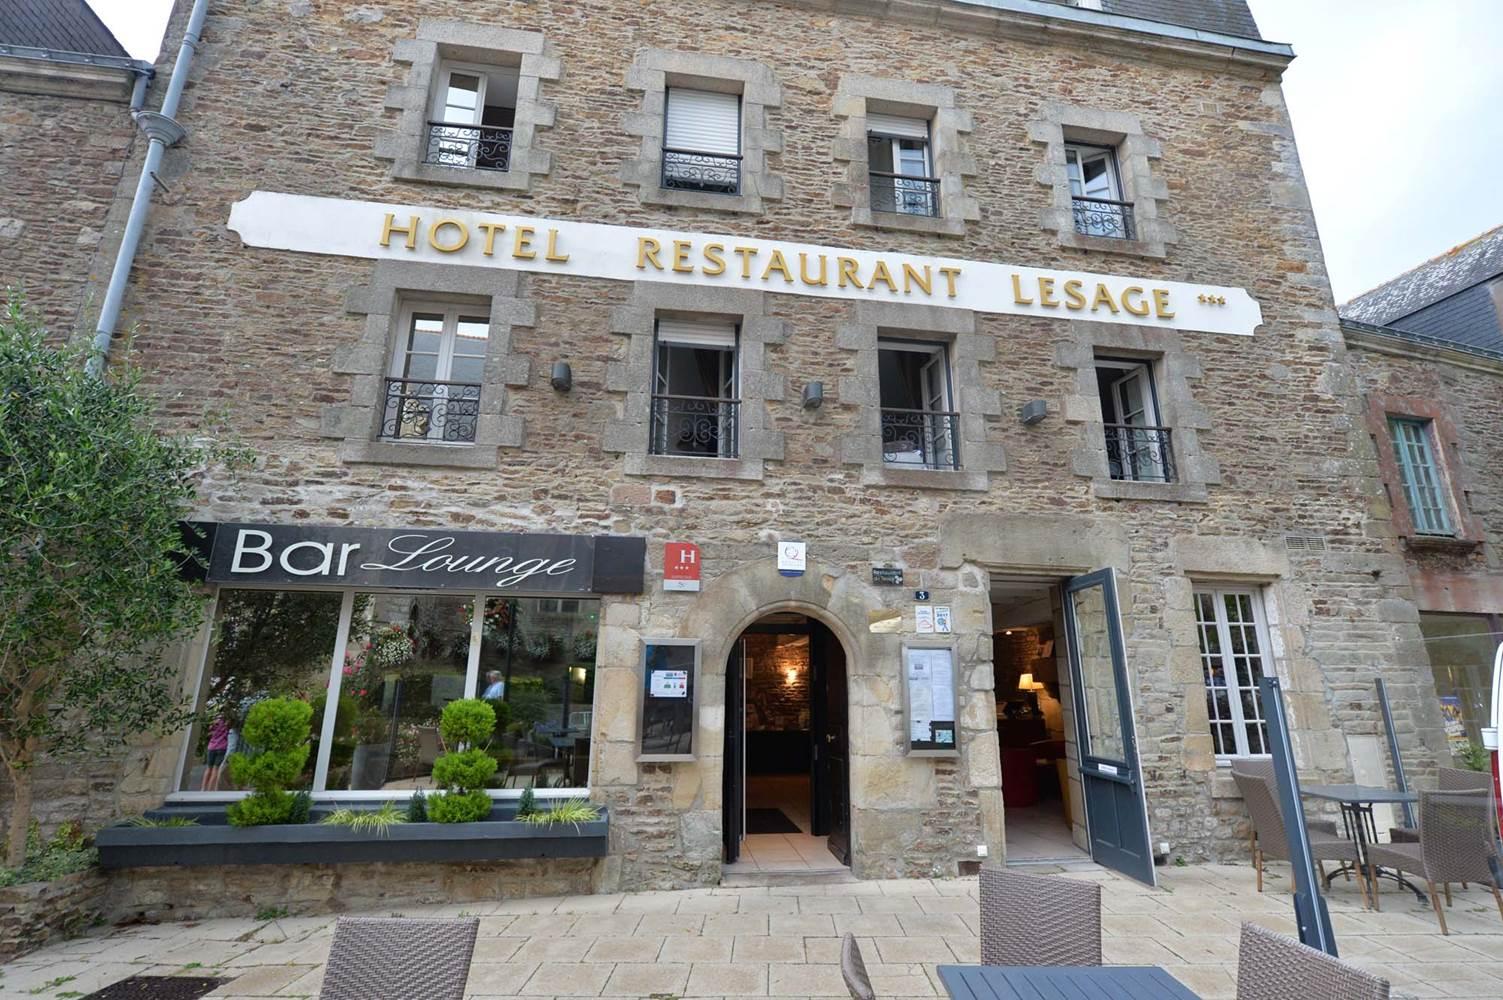 Hôtel-Restaurant-Lesage-Sarzeau-Golfe-du-Morbihan-Bretagne sud-08 © Michel RENAC